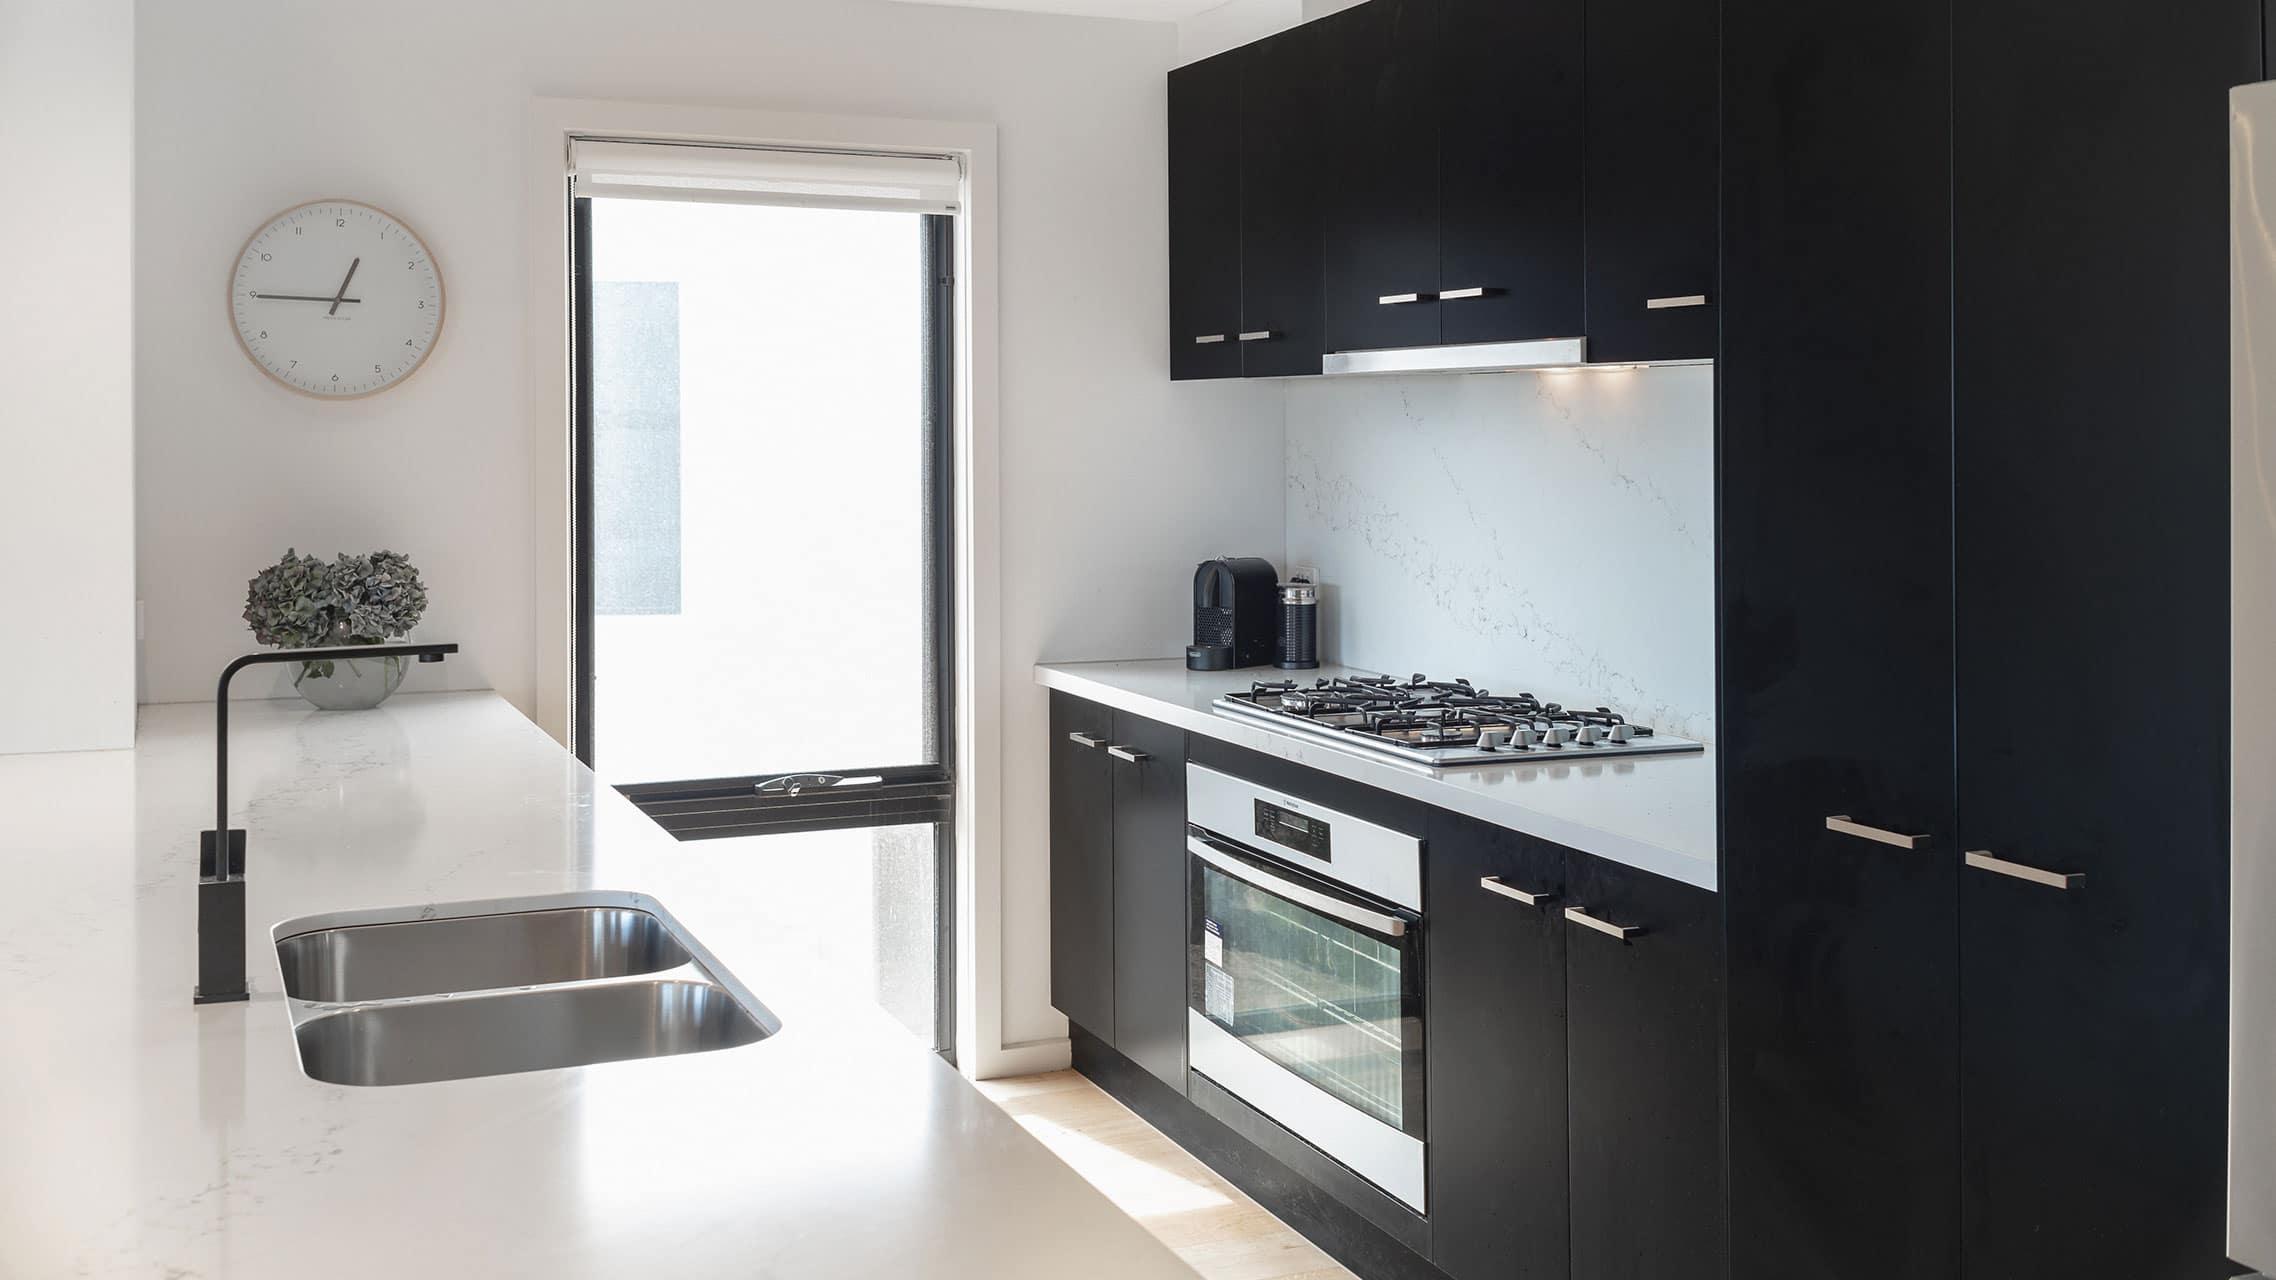 Black Aluminium Awning Window in a kitchen